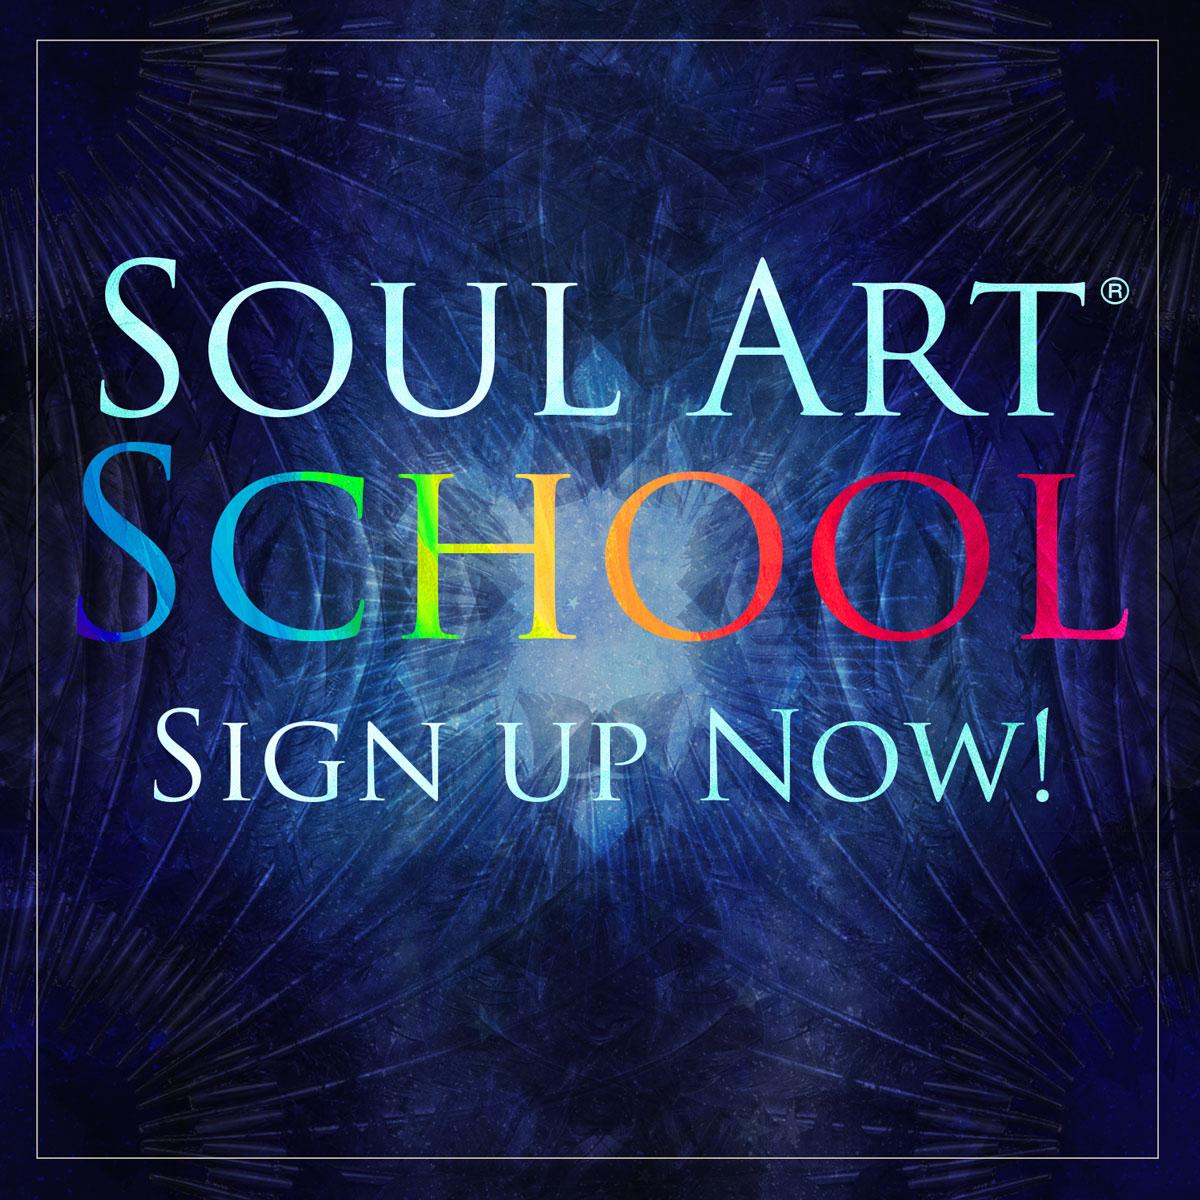 Soul Art School Sign Up Now!